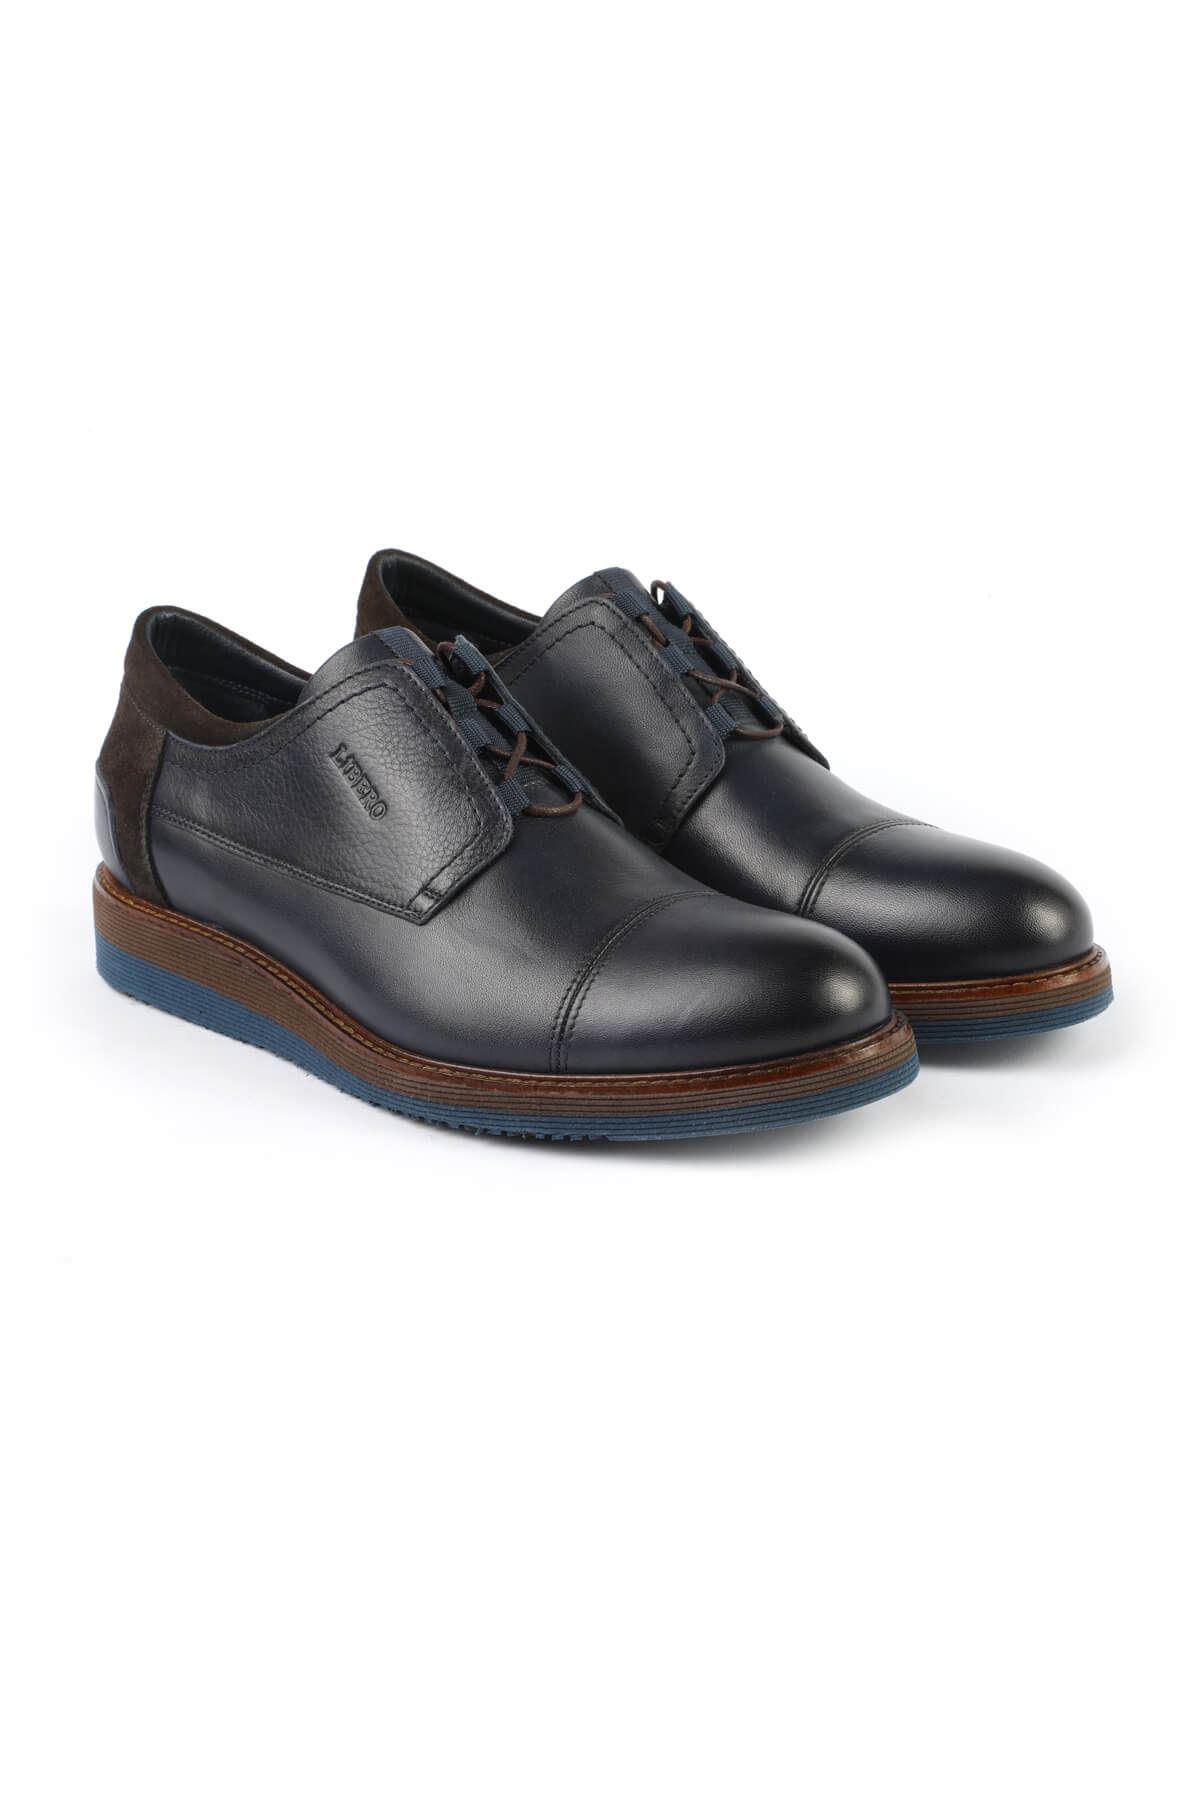 Libero 2646 Navy Blue Oxford Shoes